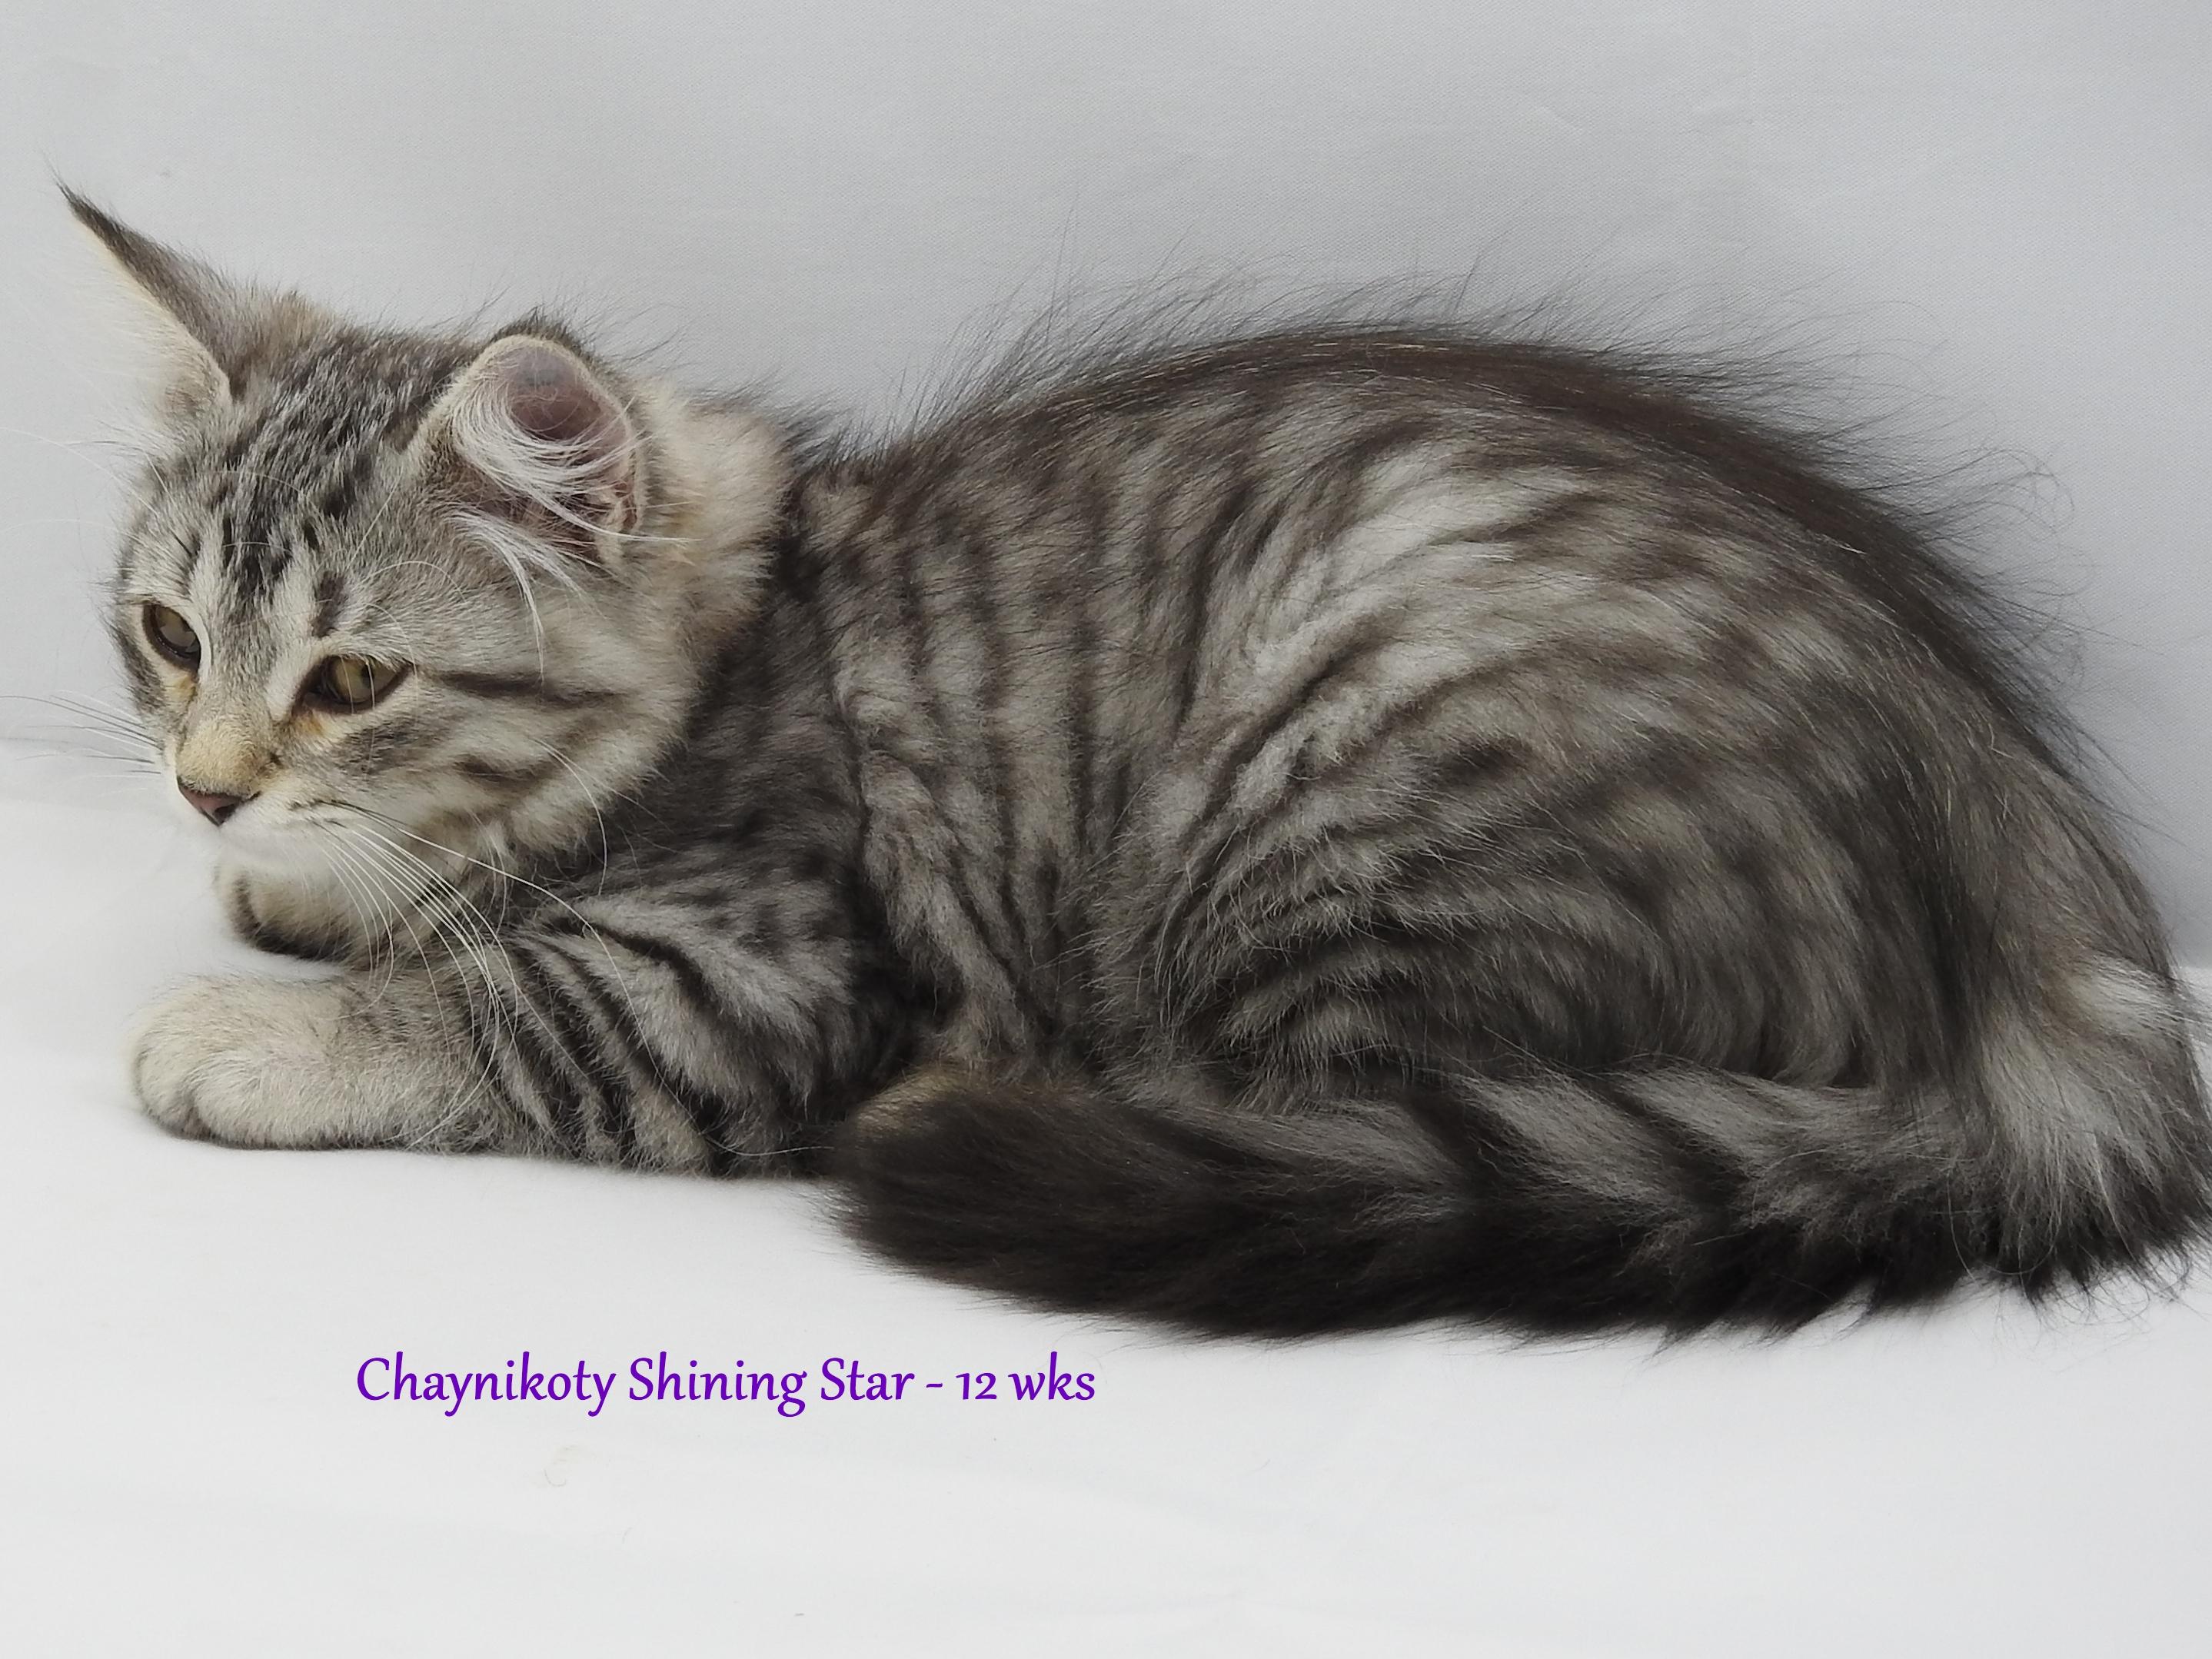 Chaynikoty Shining Star - 12 wks